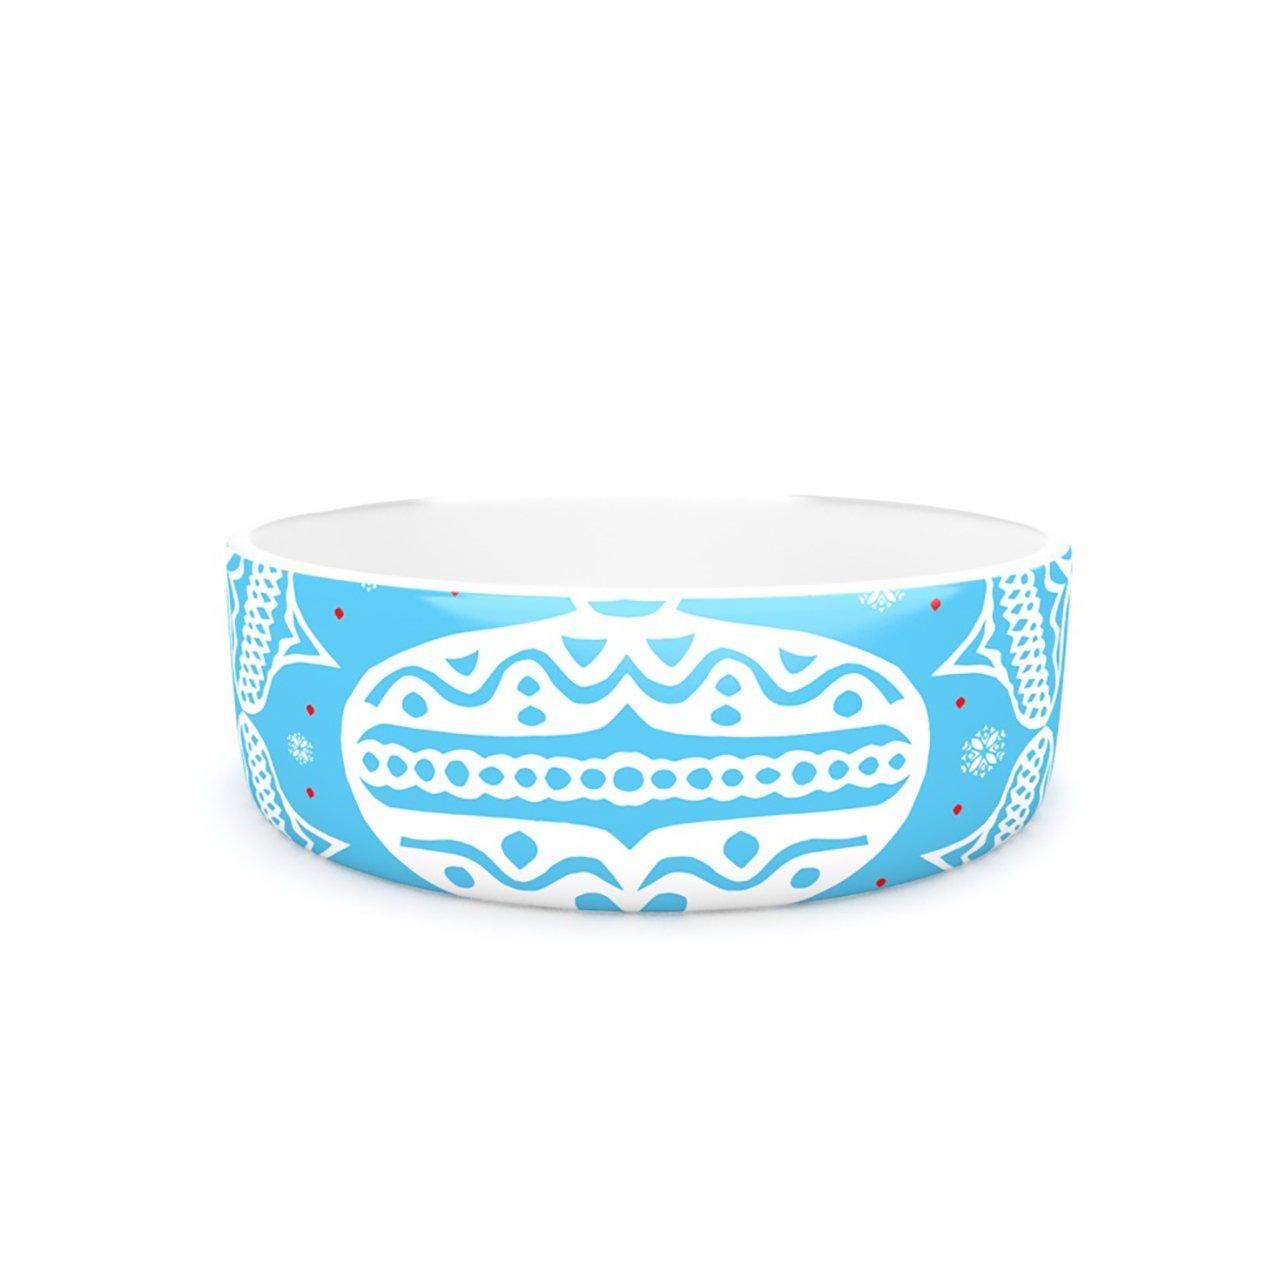 Kess InHouse Miranda Mol Deco Wreath bluee  Pet Bowl, 7-Inch, Aqua